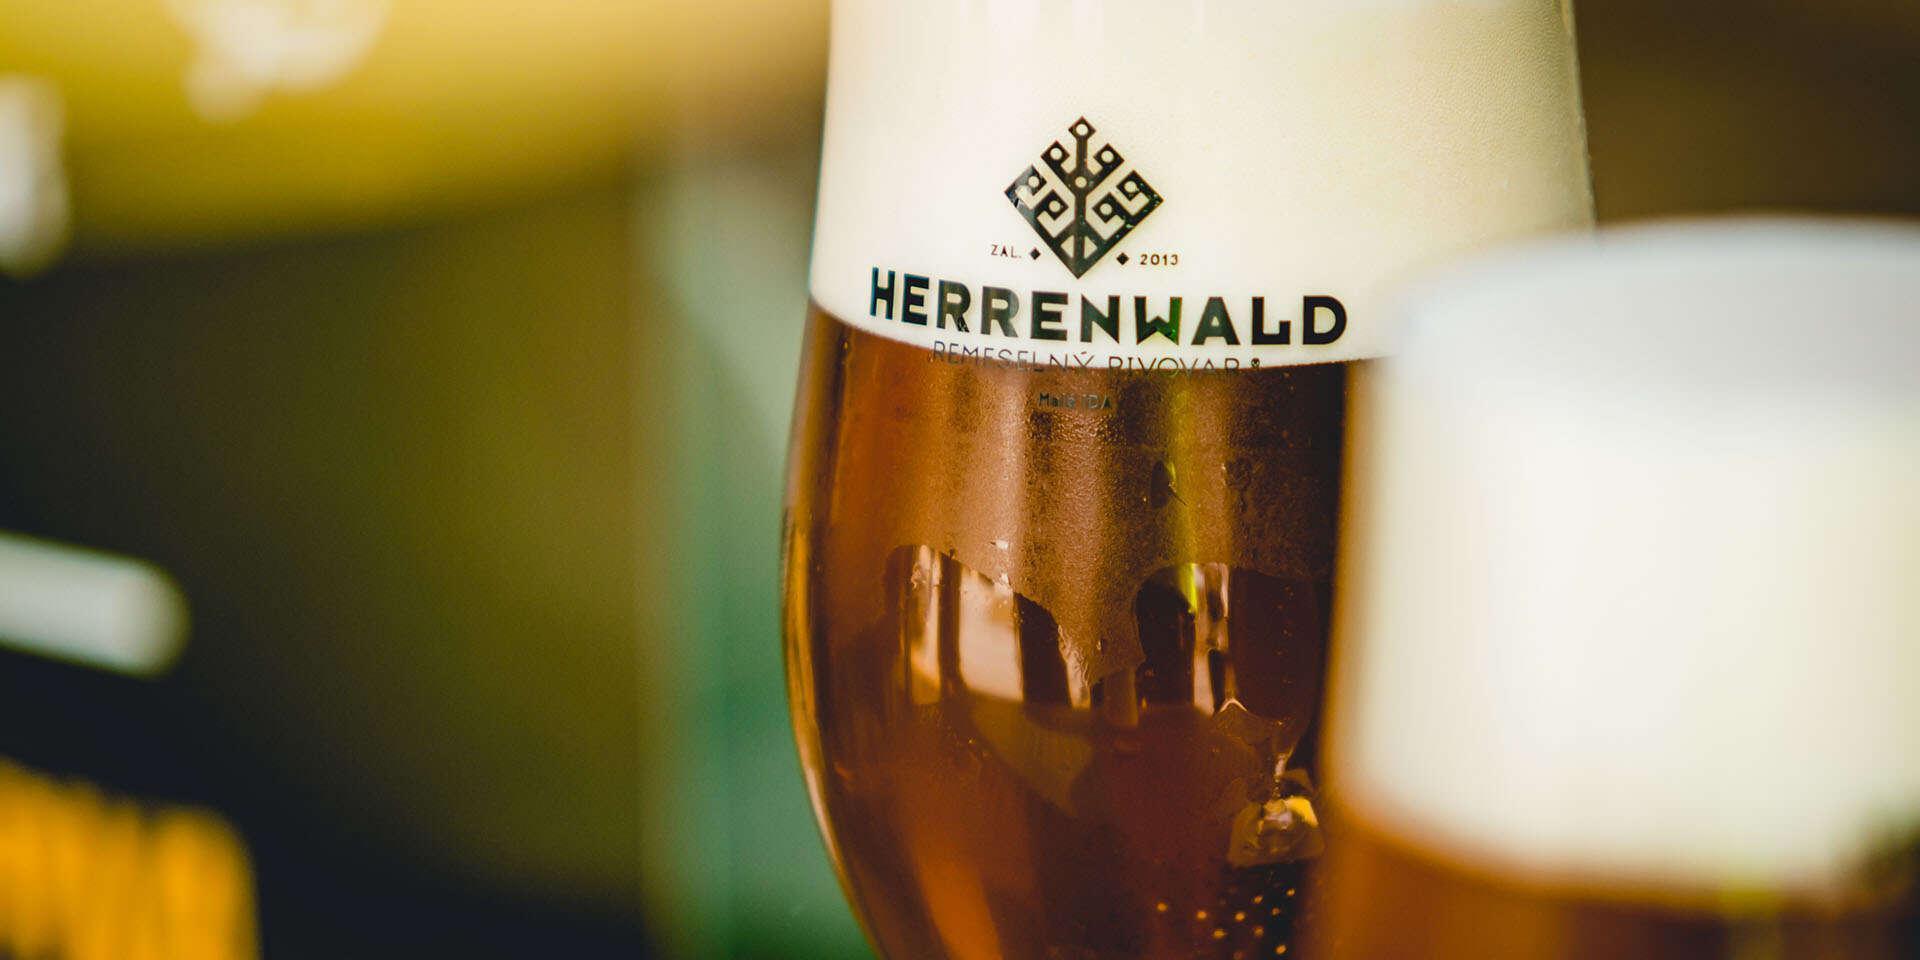 Remeselné pivovary Herrenwald